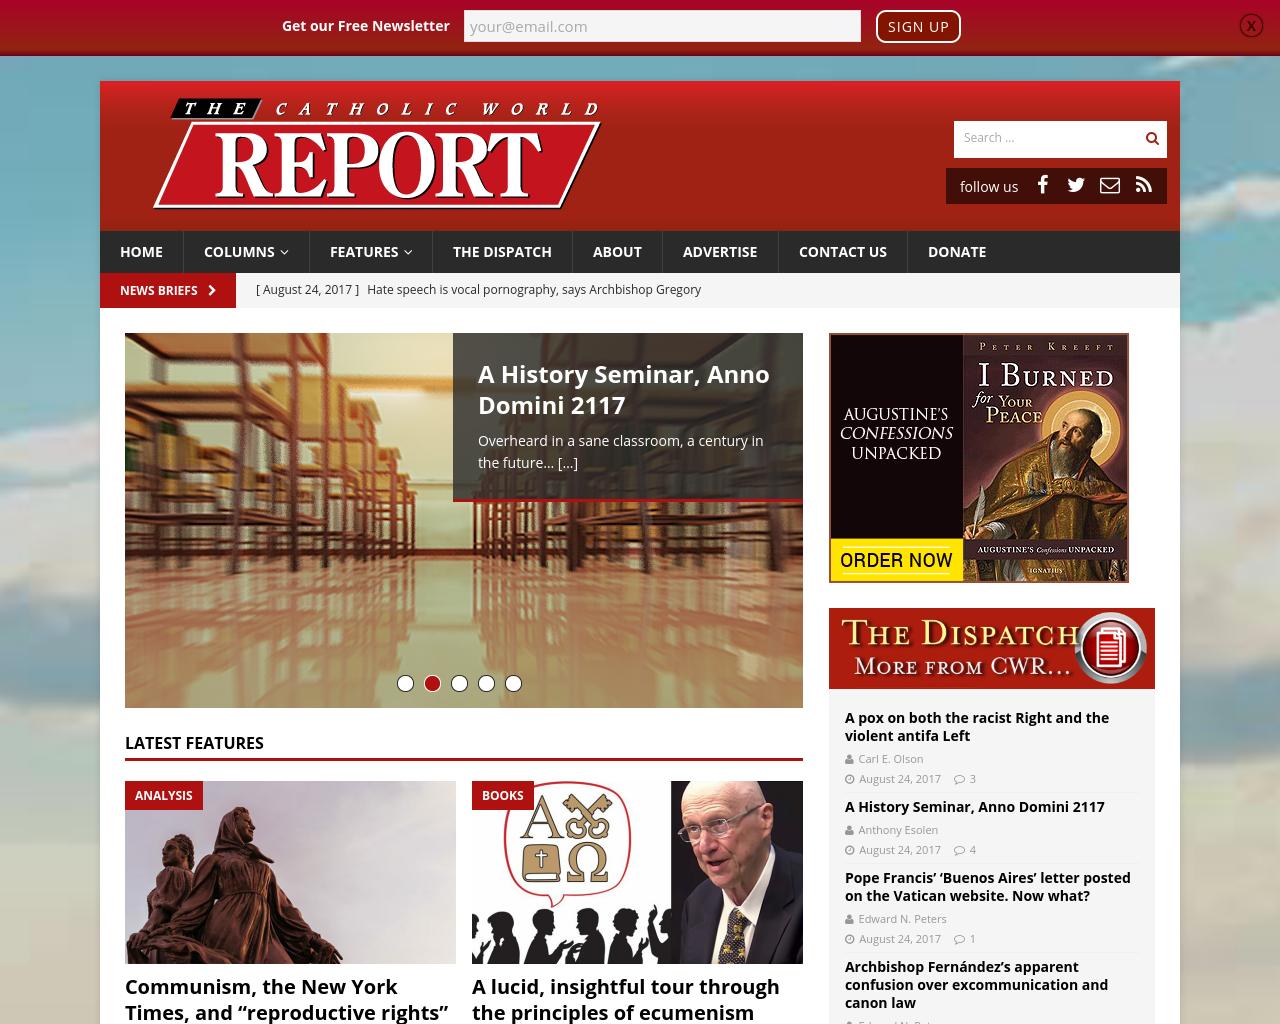 Catholic-World-Report-Advertising-Reviews-Pricing